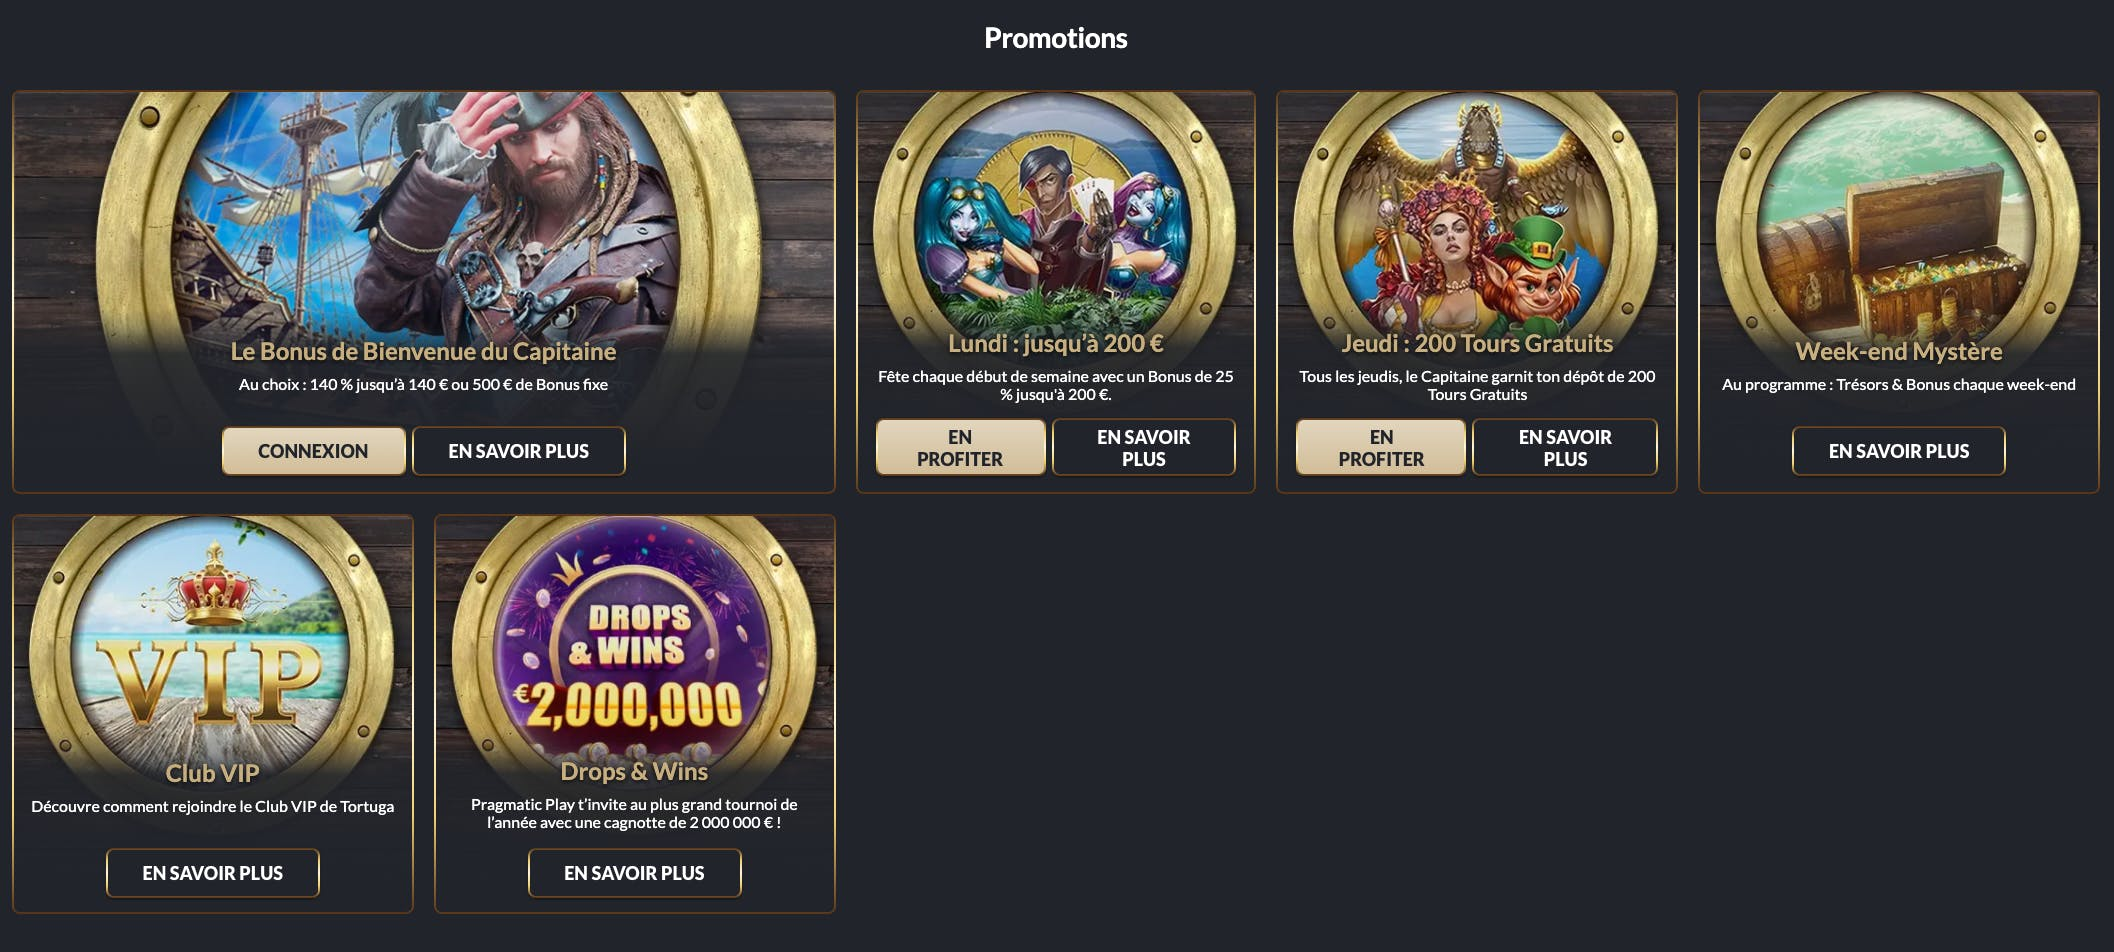 promotions tortuga casino